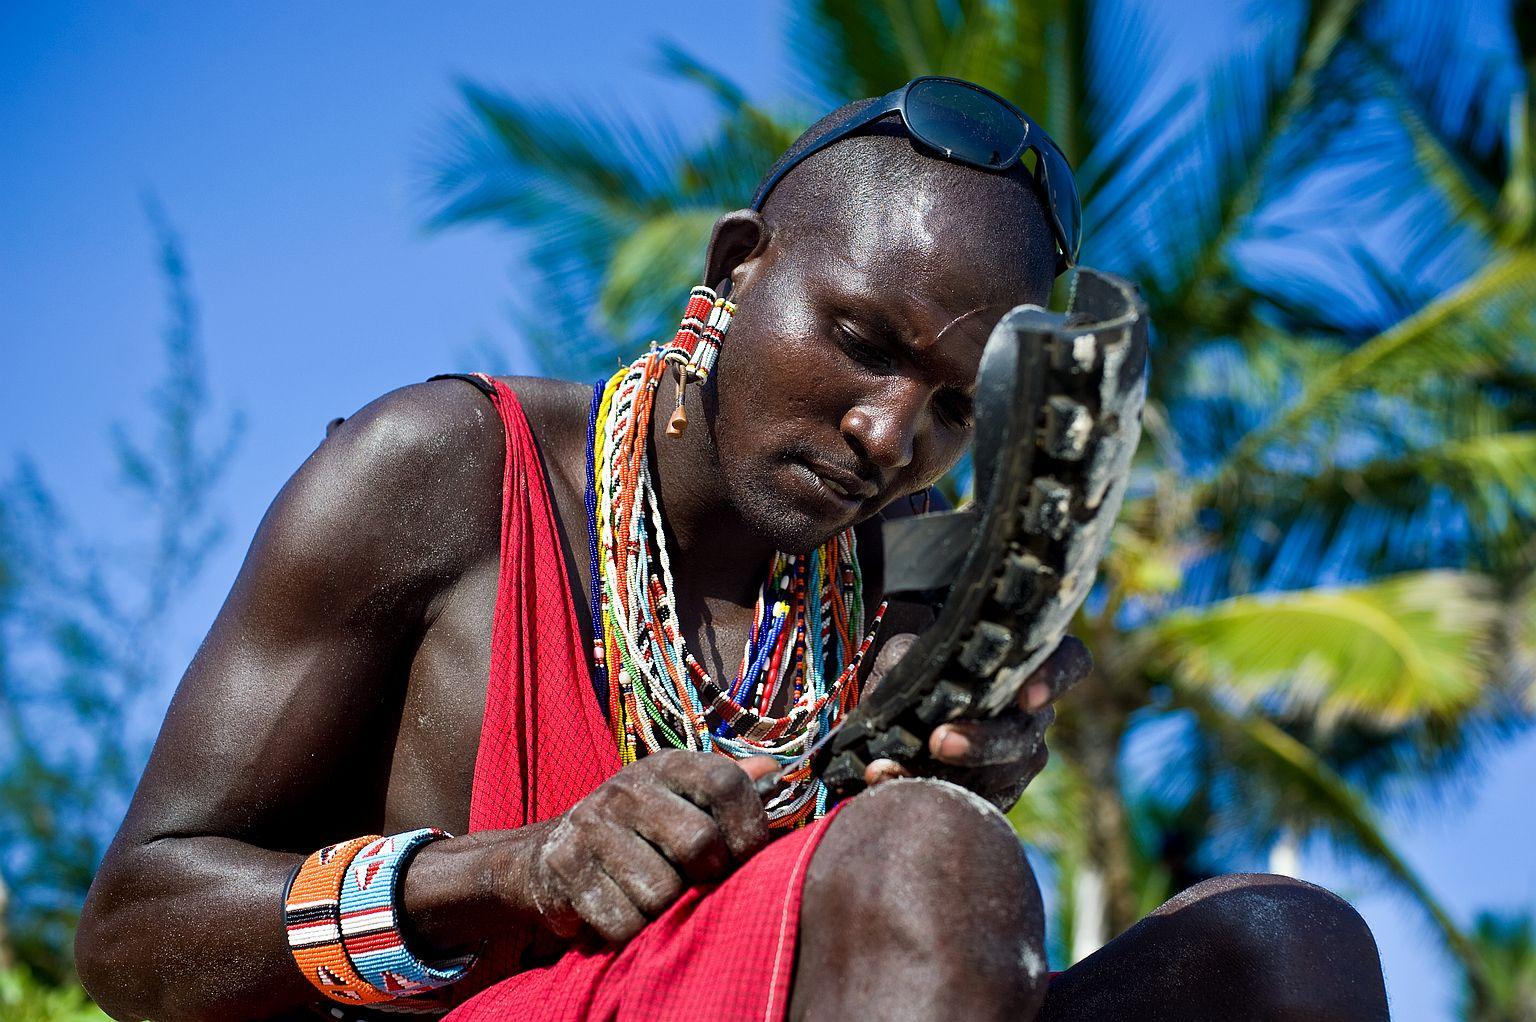 Tak vypadá živý Masaj.